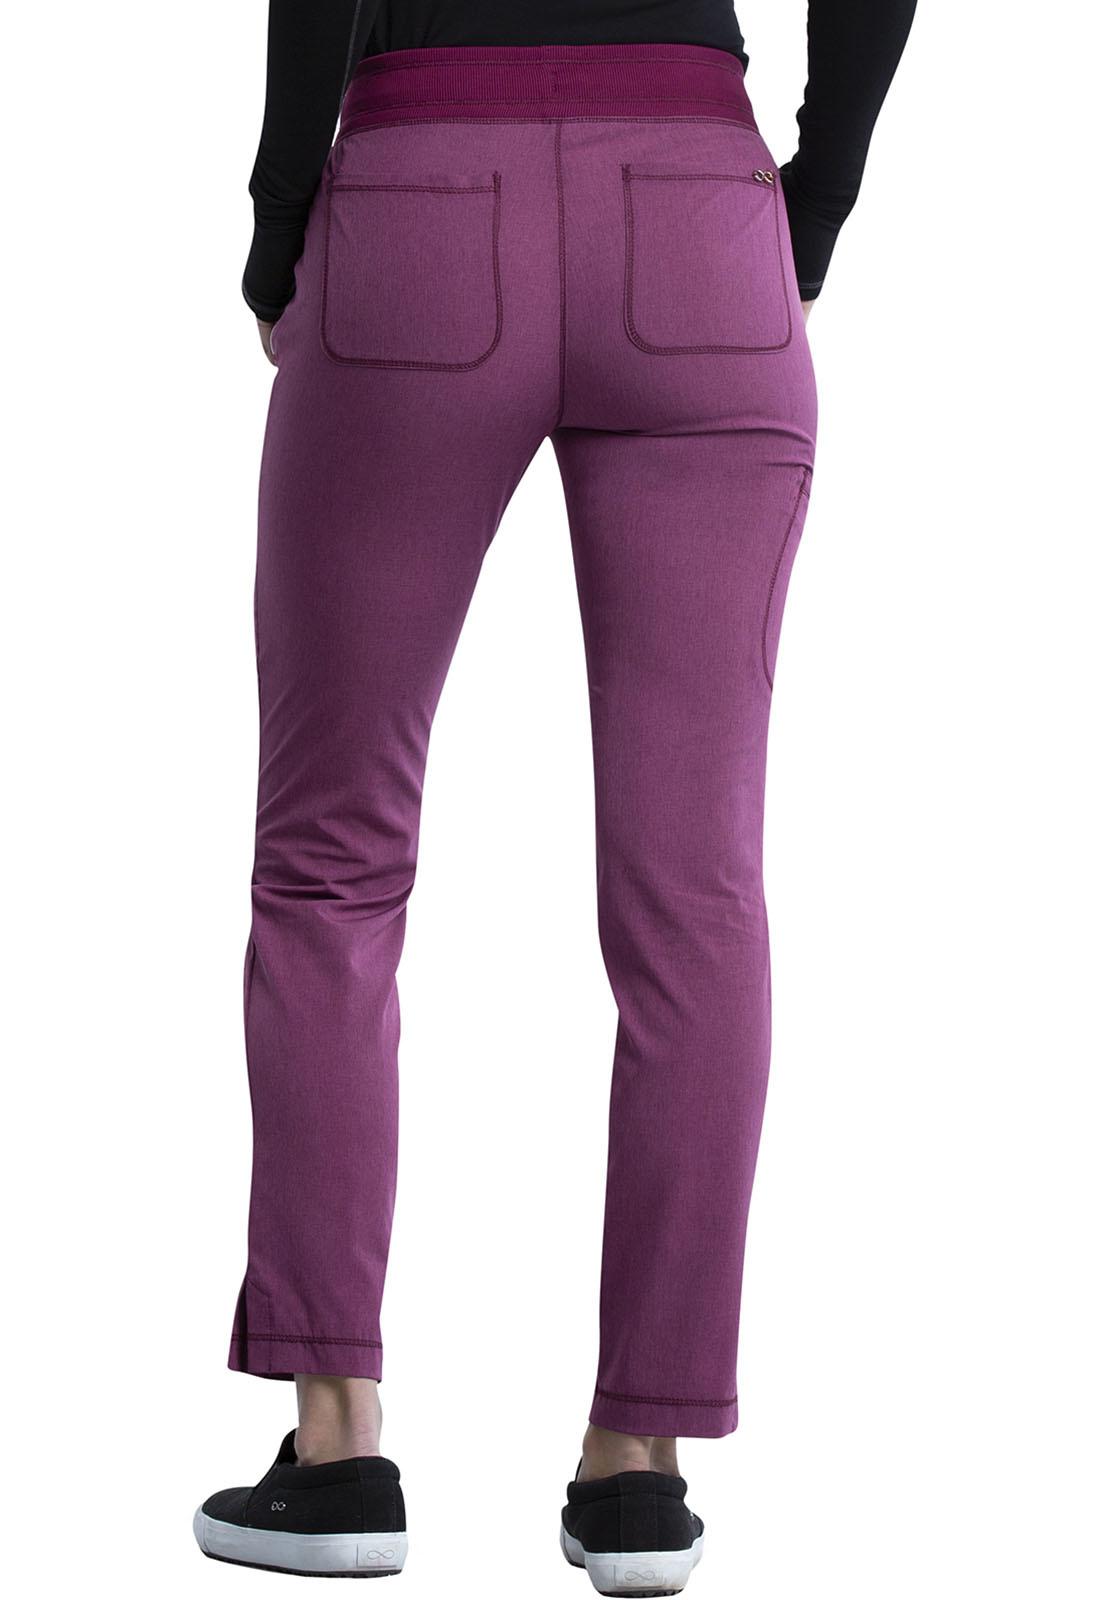 CHEROKEE Pull-on Pant Heather Wine CK135A